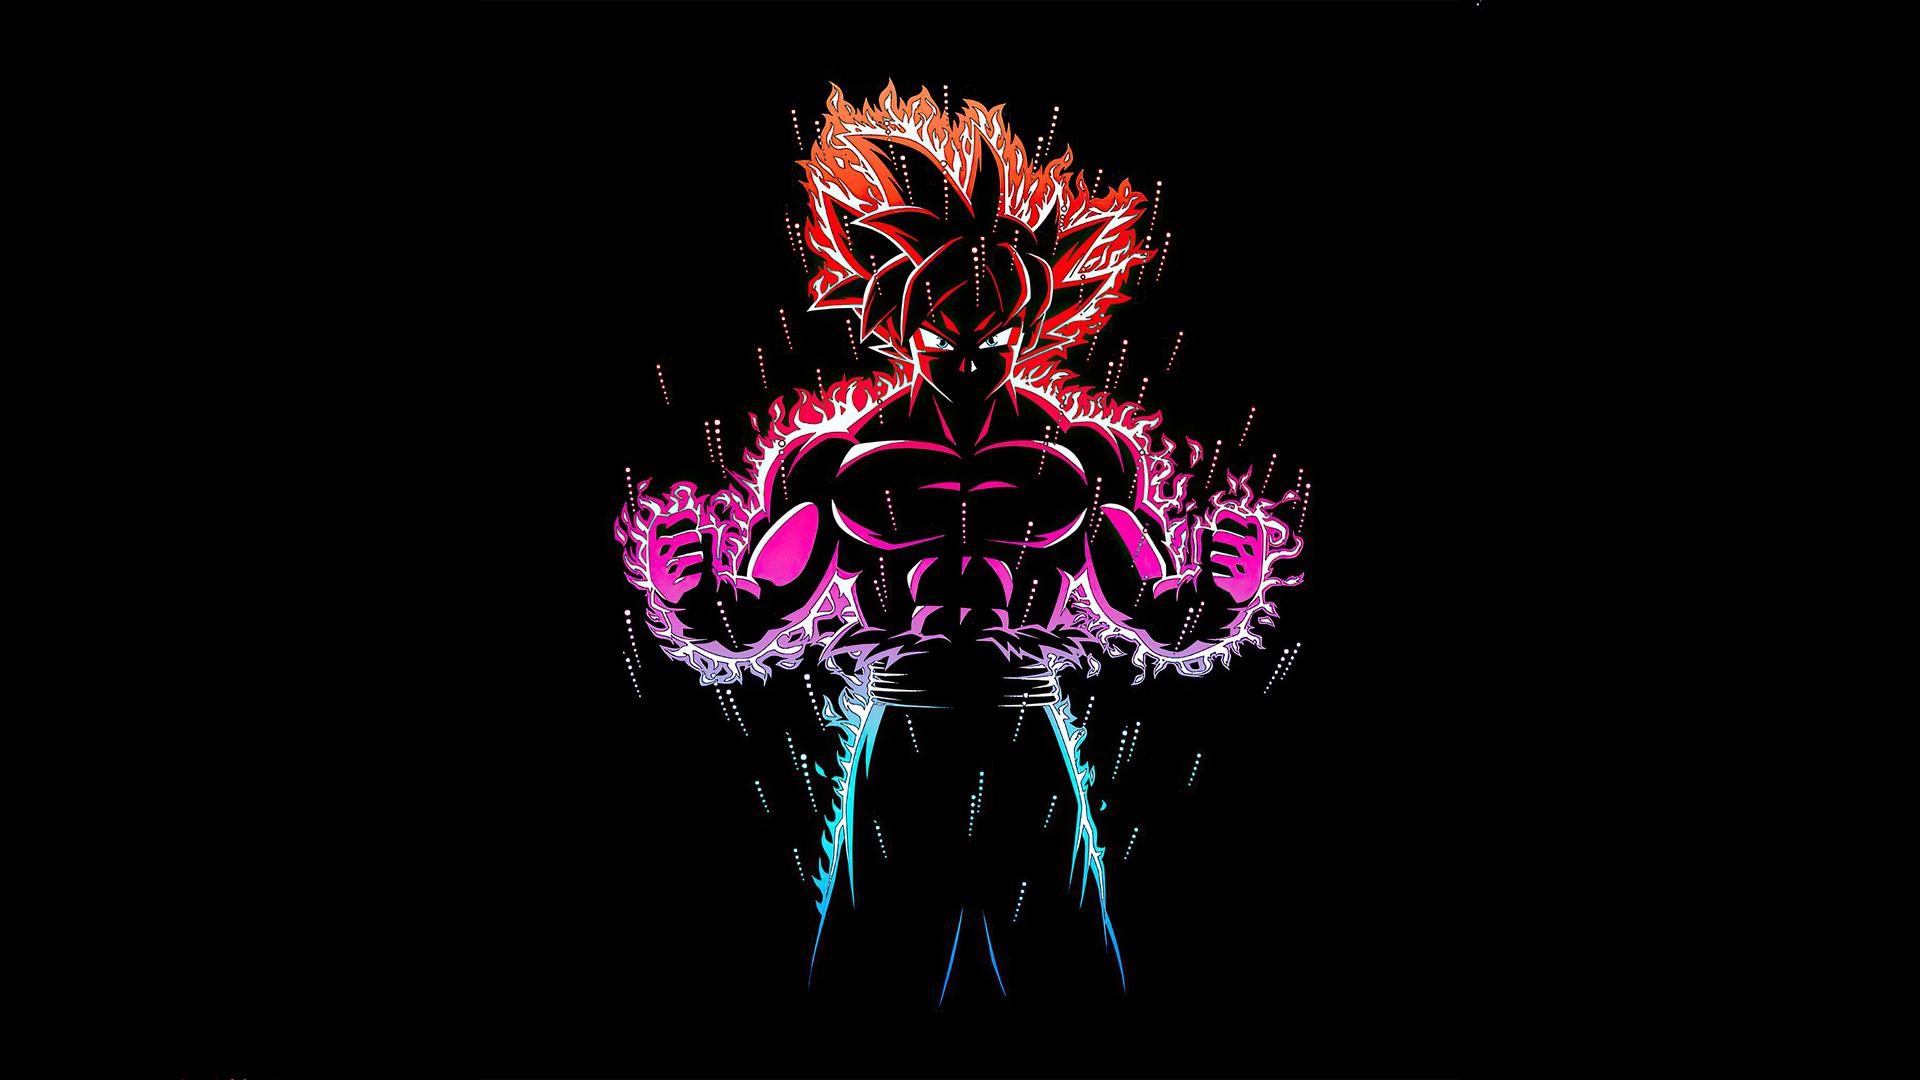 dragon-ball-z-goku-ultra-instinct-fire-4k-lt.jpg